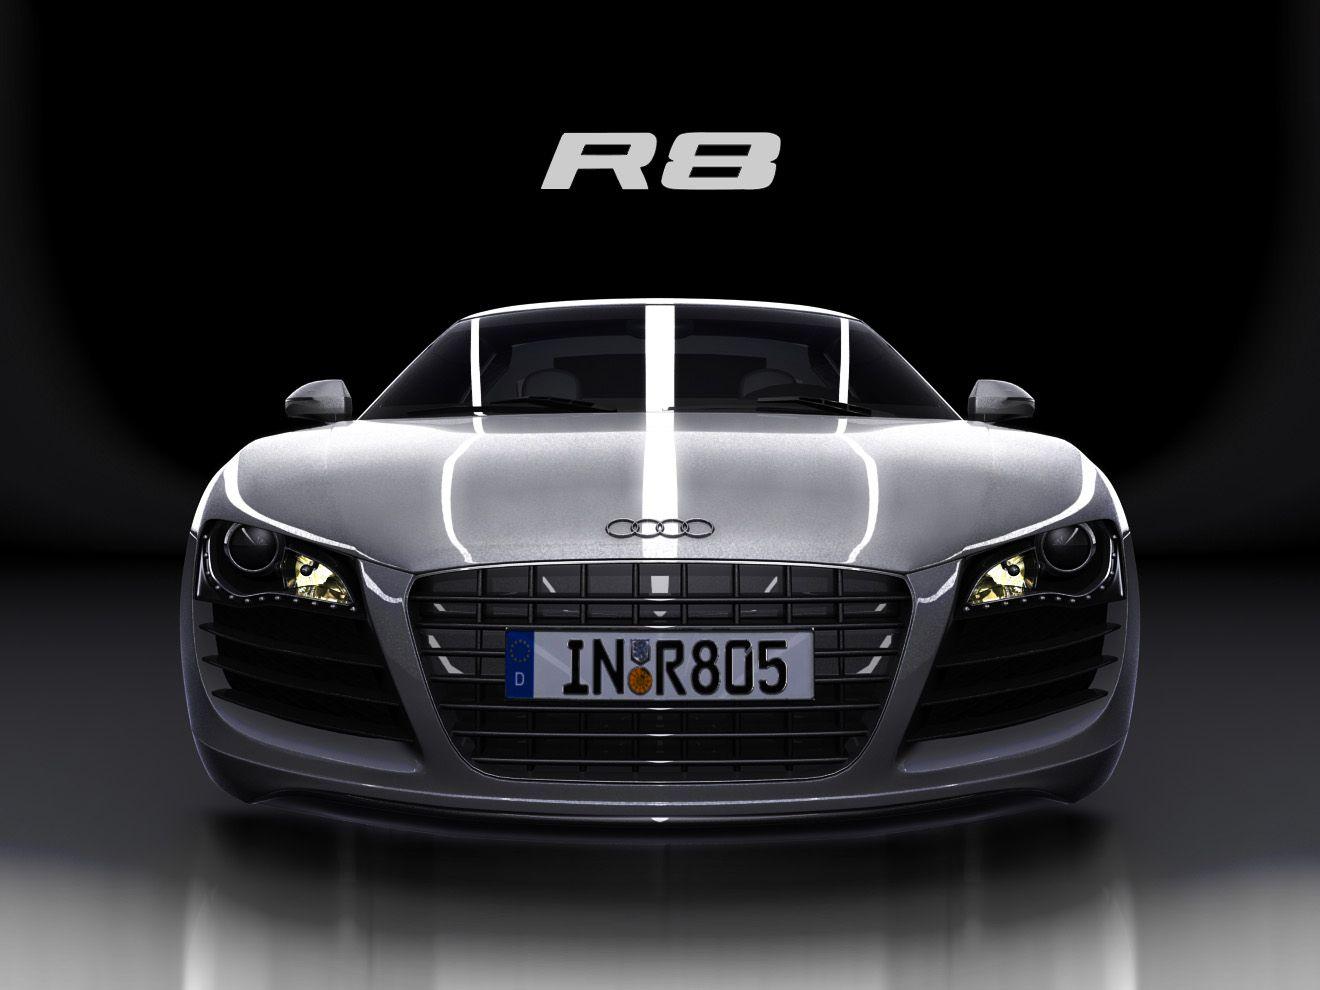 Audi Wallpaper Handy Best Und Wallpaper Mobil Sport